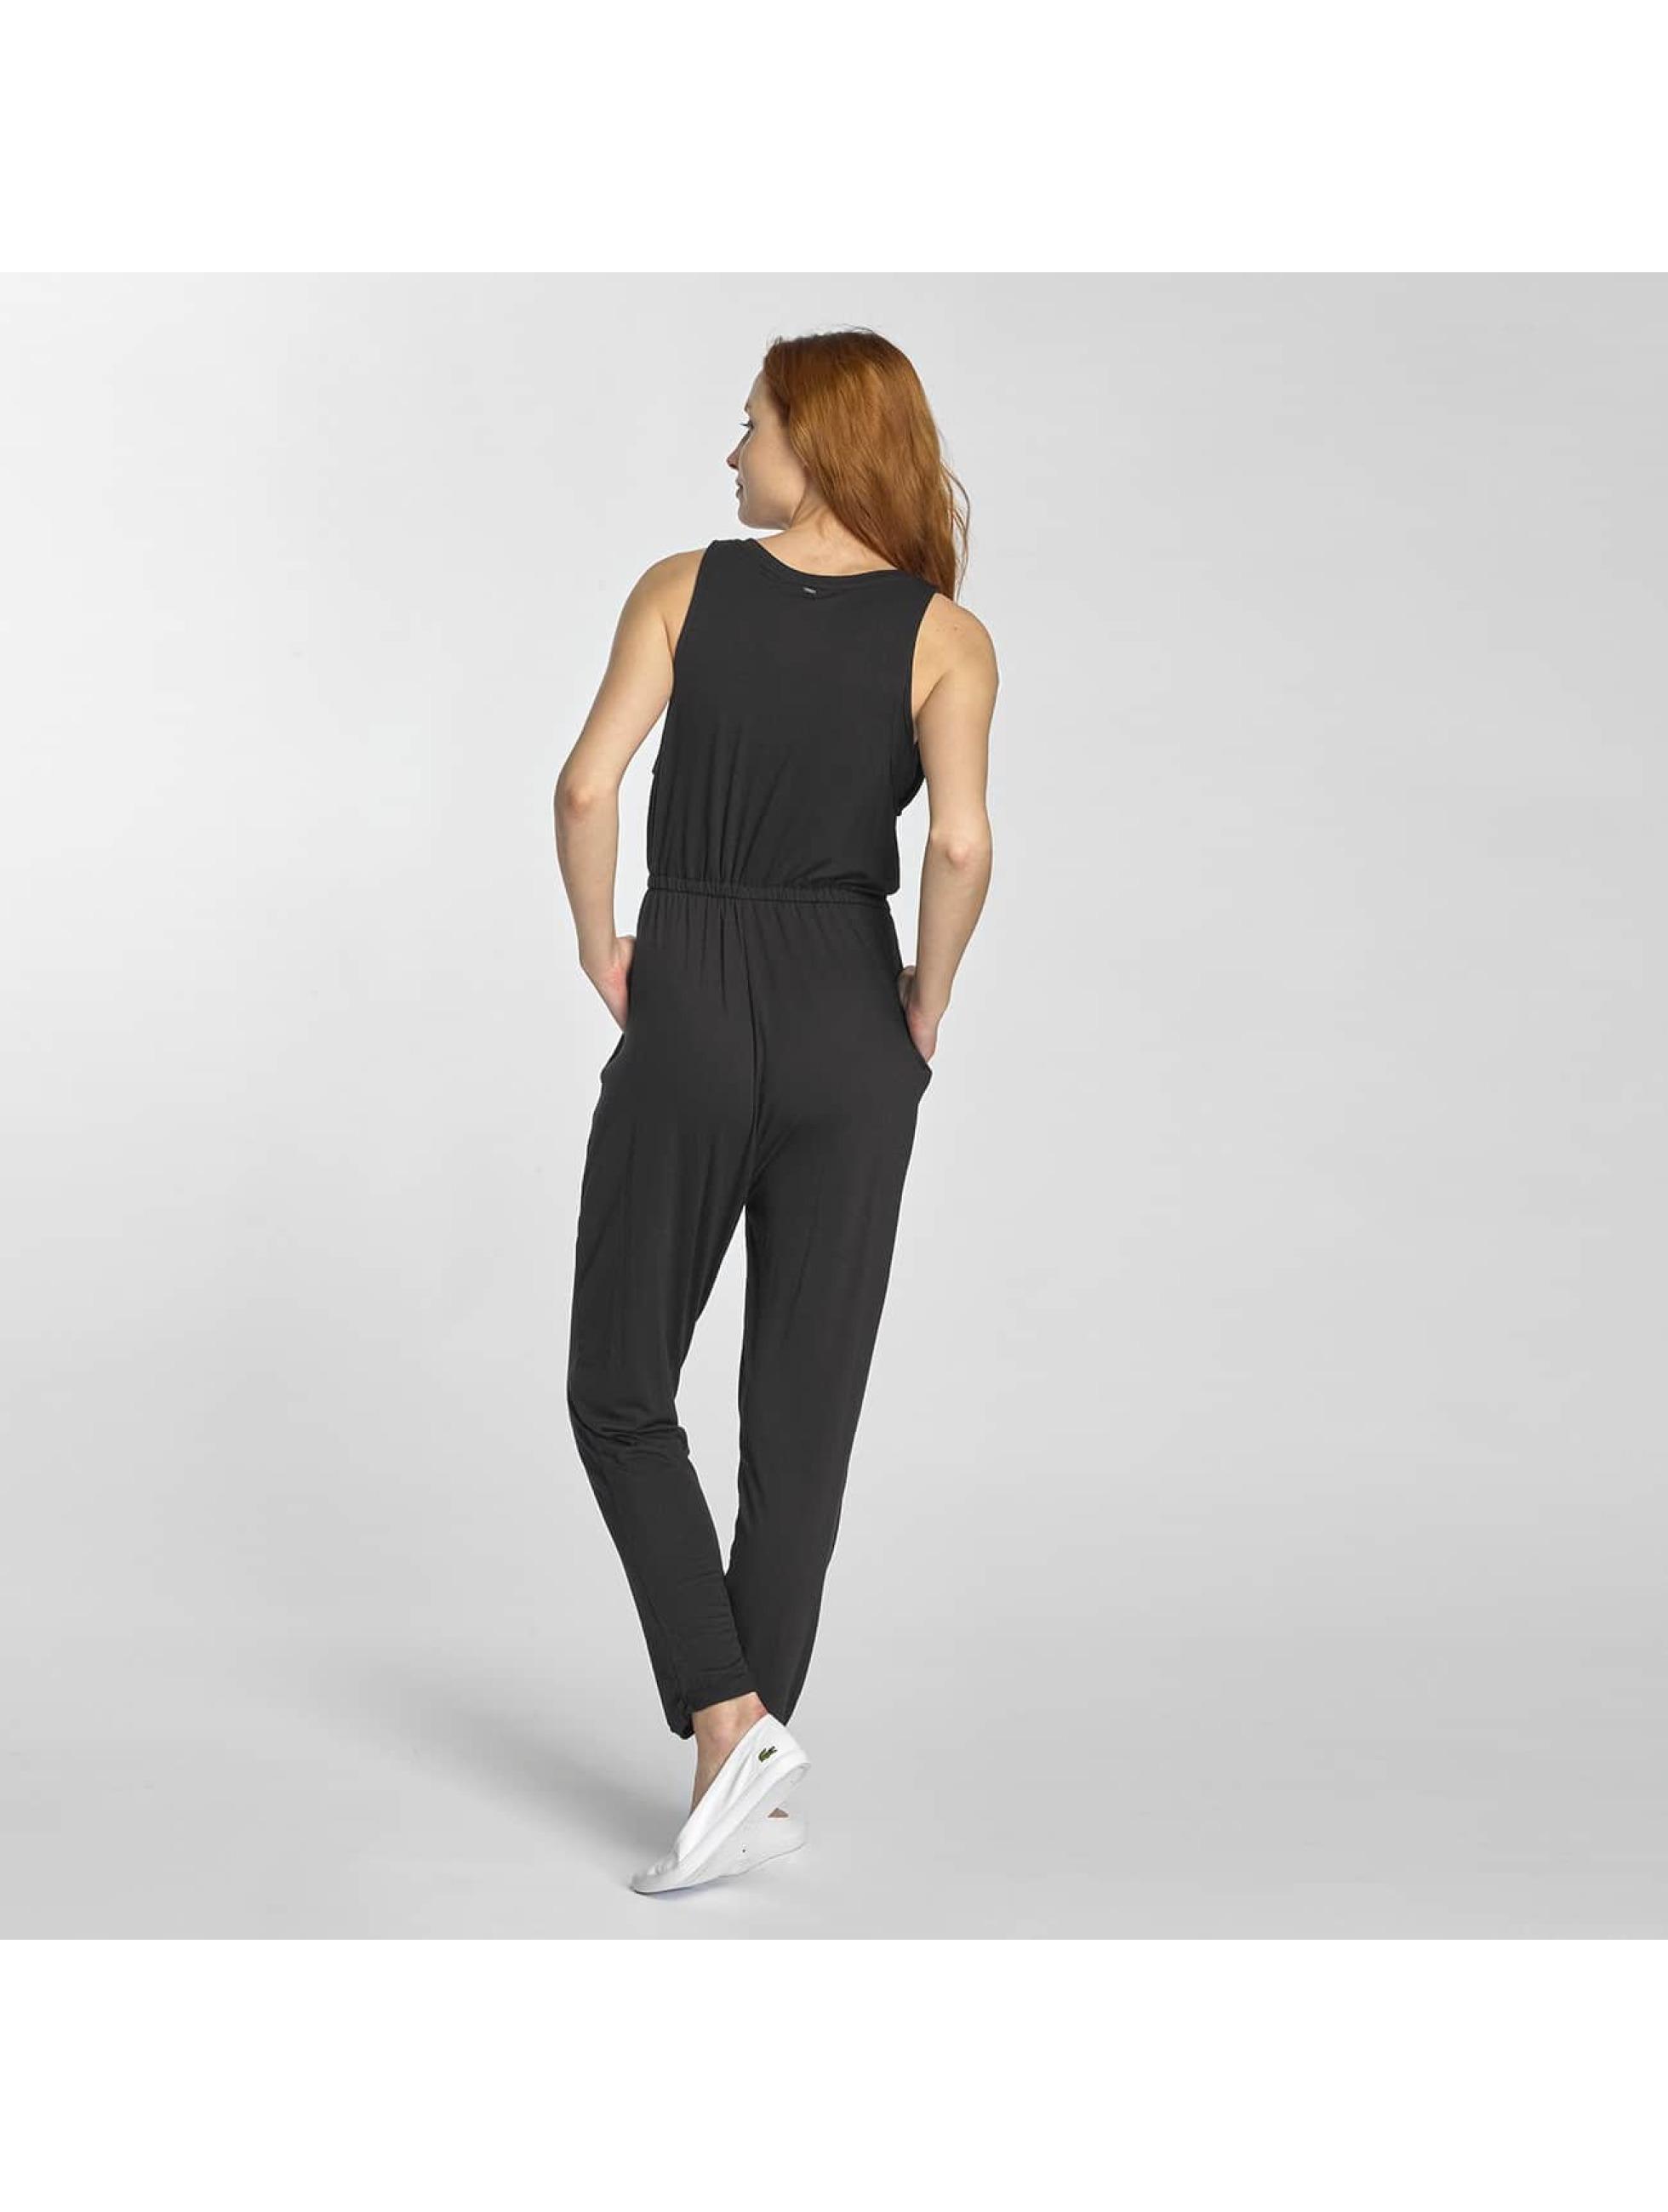 khujo damen jumpsuit necy in schwarz 312832. Black Bedroom Furniture Sets. Home Design Ideas